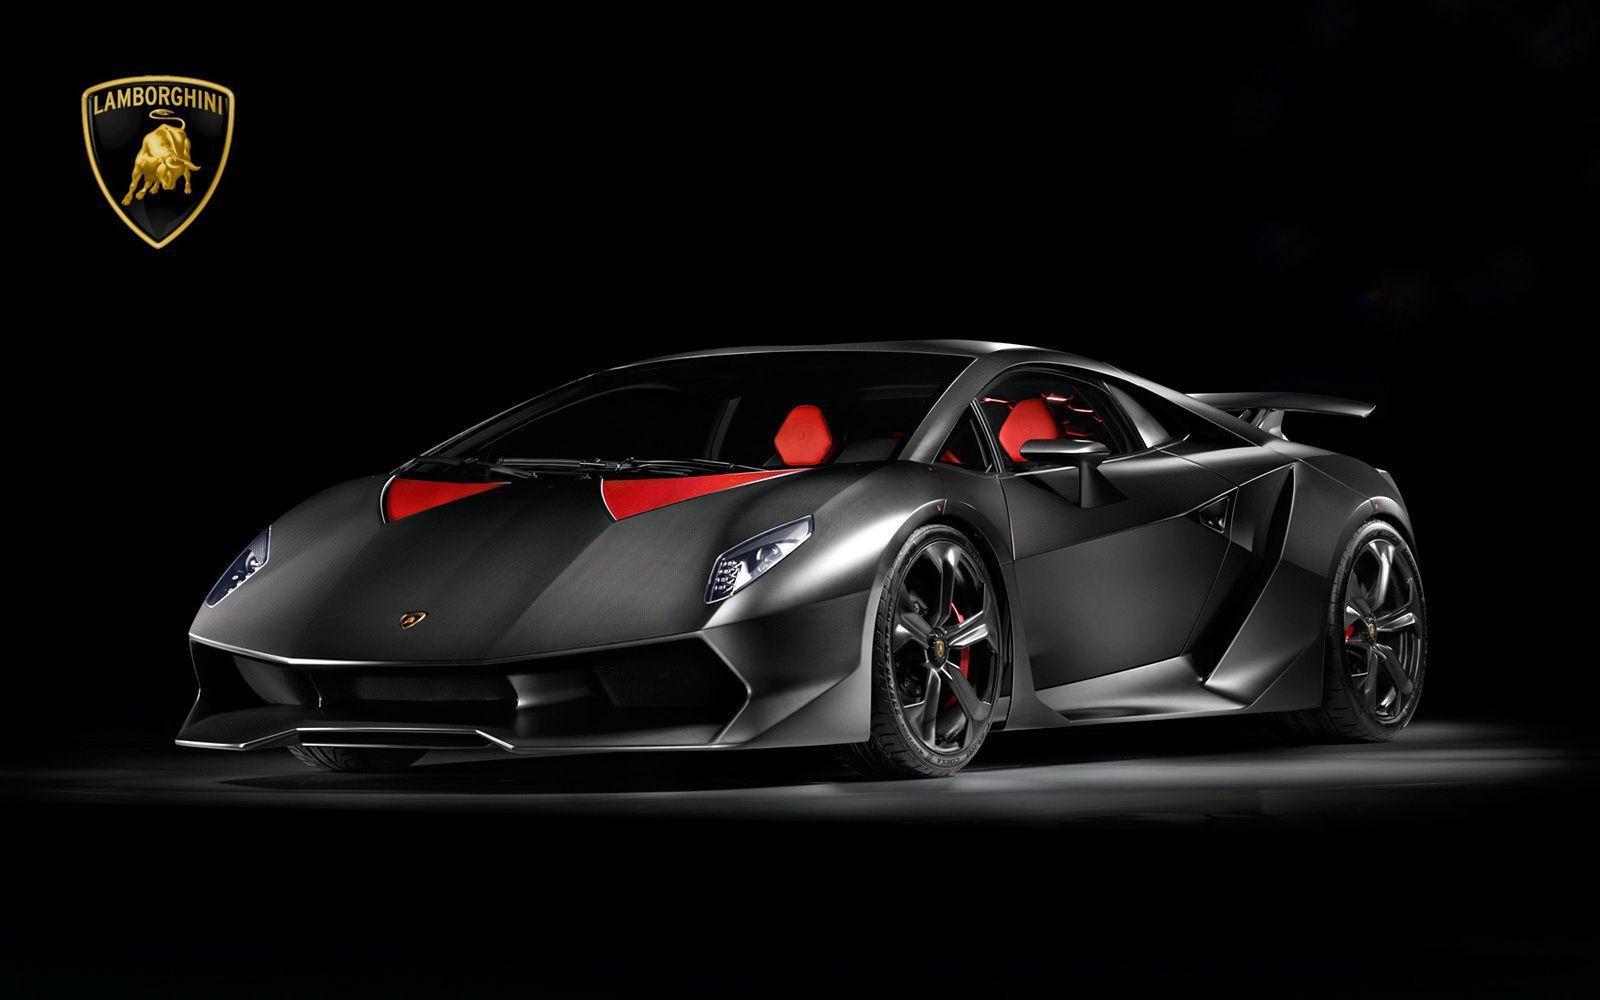 Lamborghini Desktop Backgrounds Wallpaper Cave